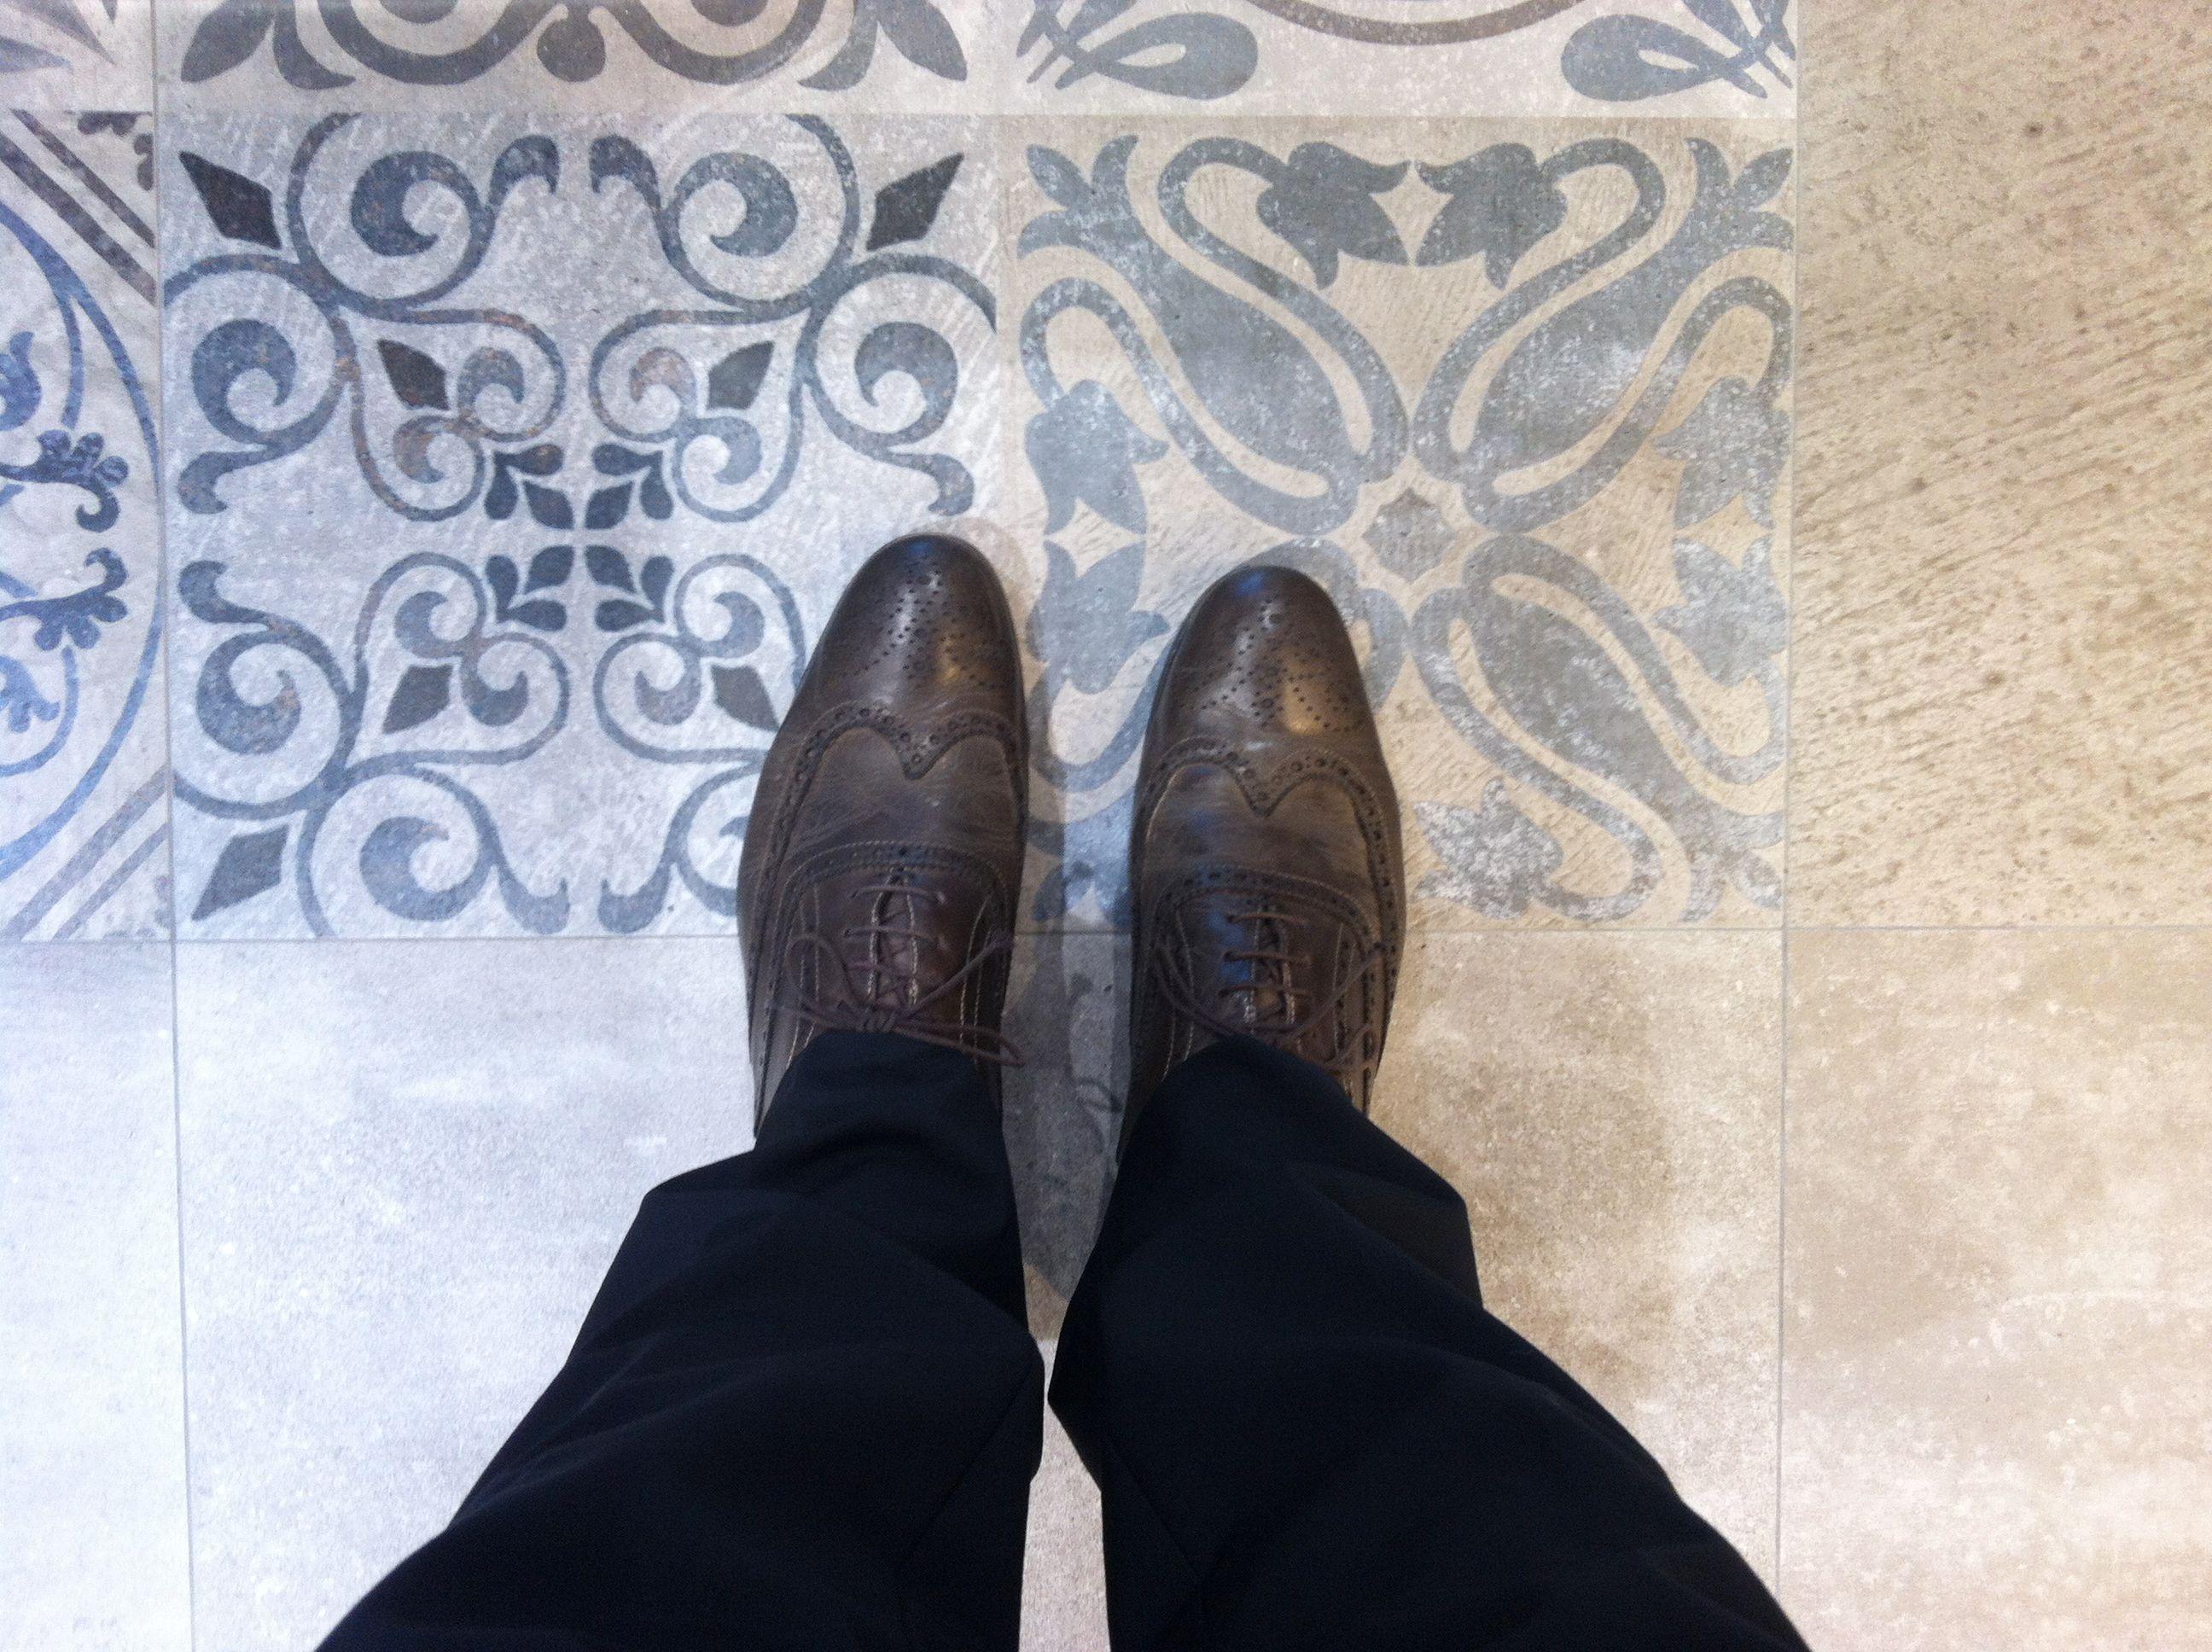 S{H}OES - Villareal Febrero 2014 #estudihac #shoesworld #jmferrero